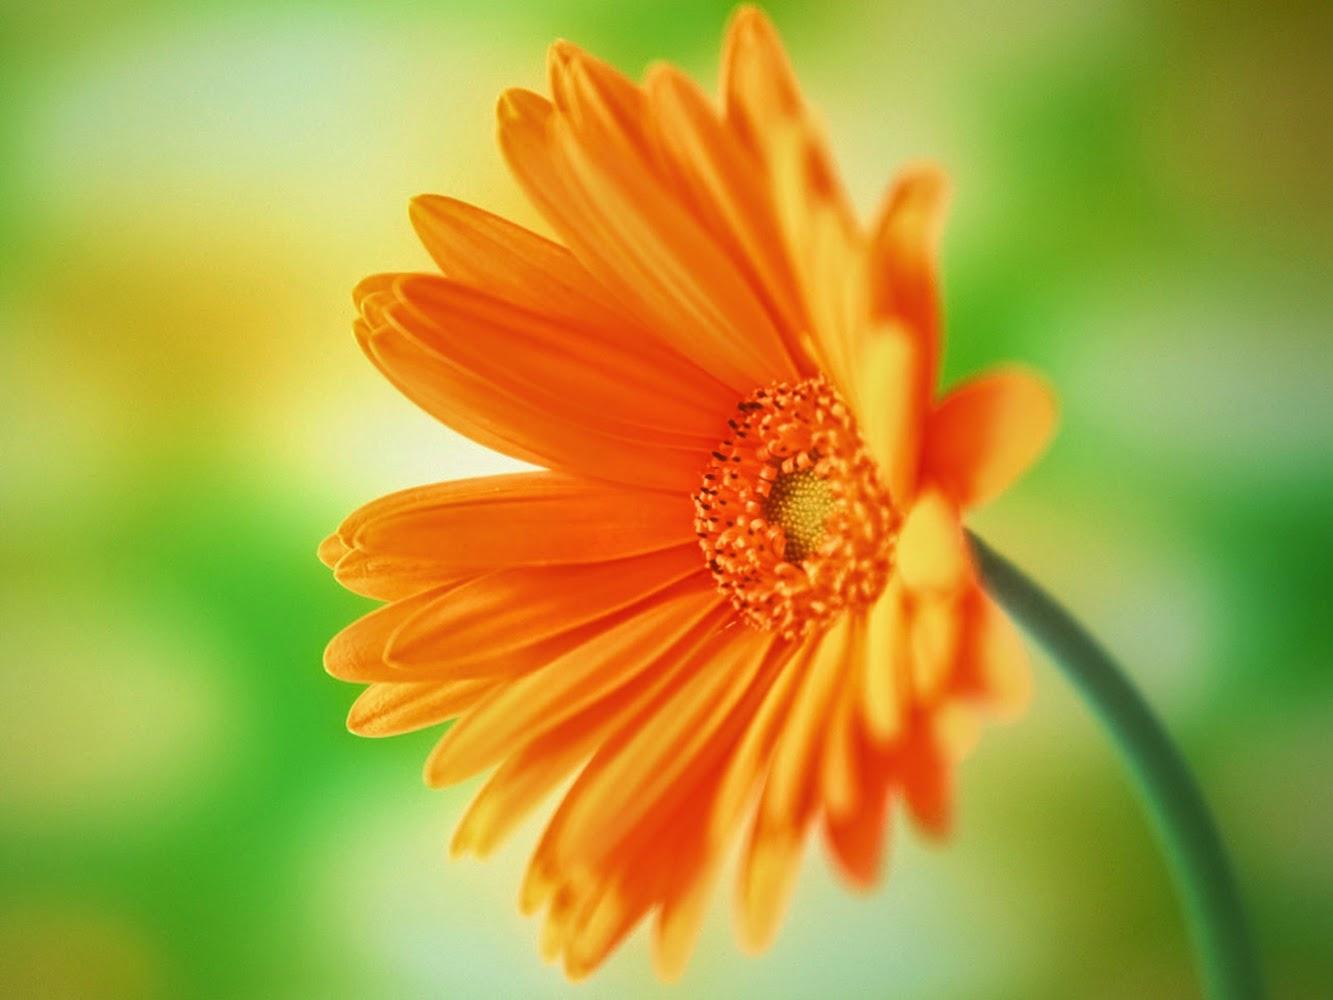 Flowers Desktop Wallpaper Background Beautiful